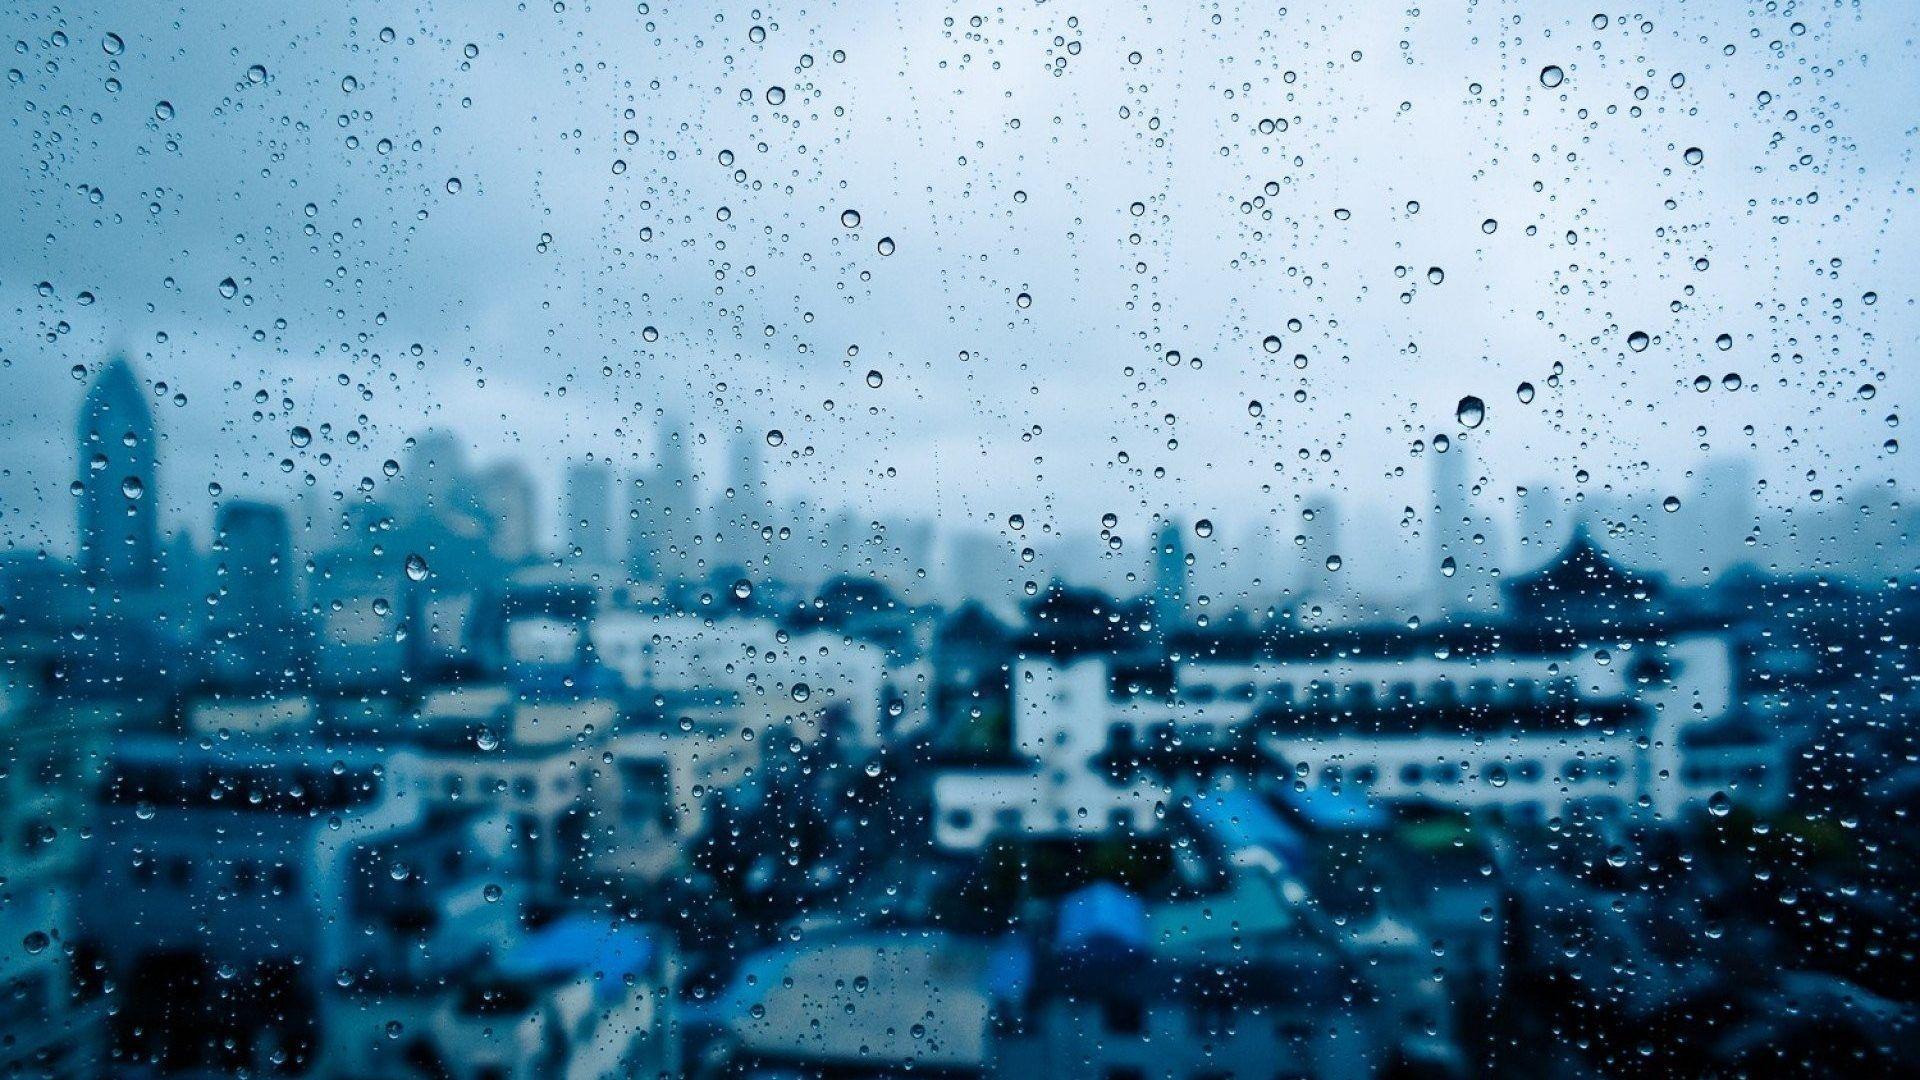 Animated Rain Wallpapers Top Free Animated Rain